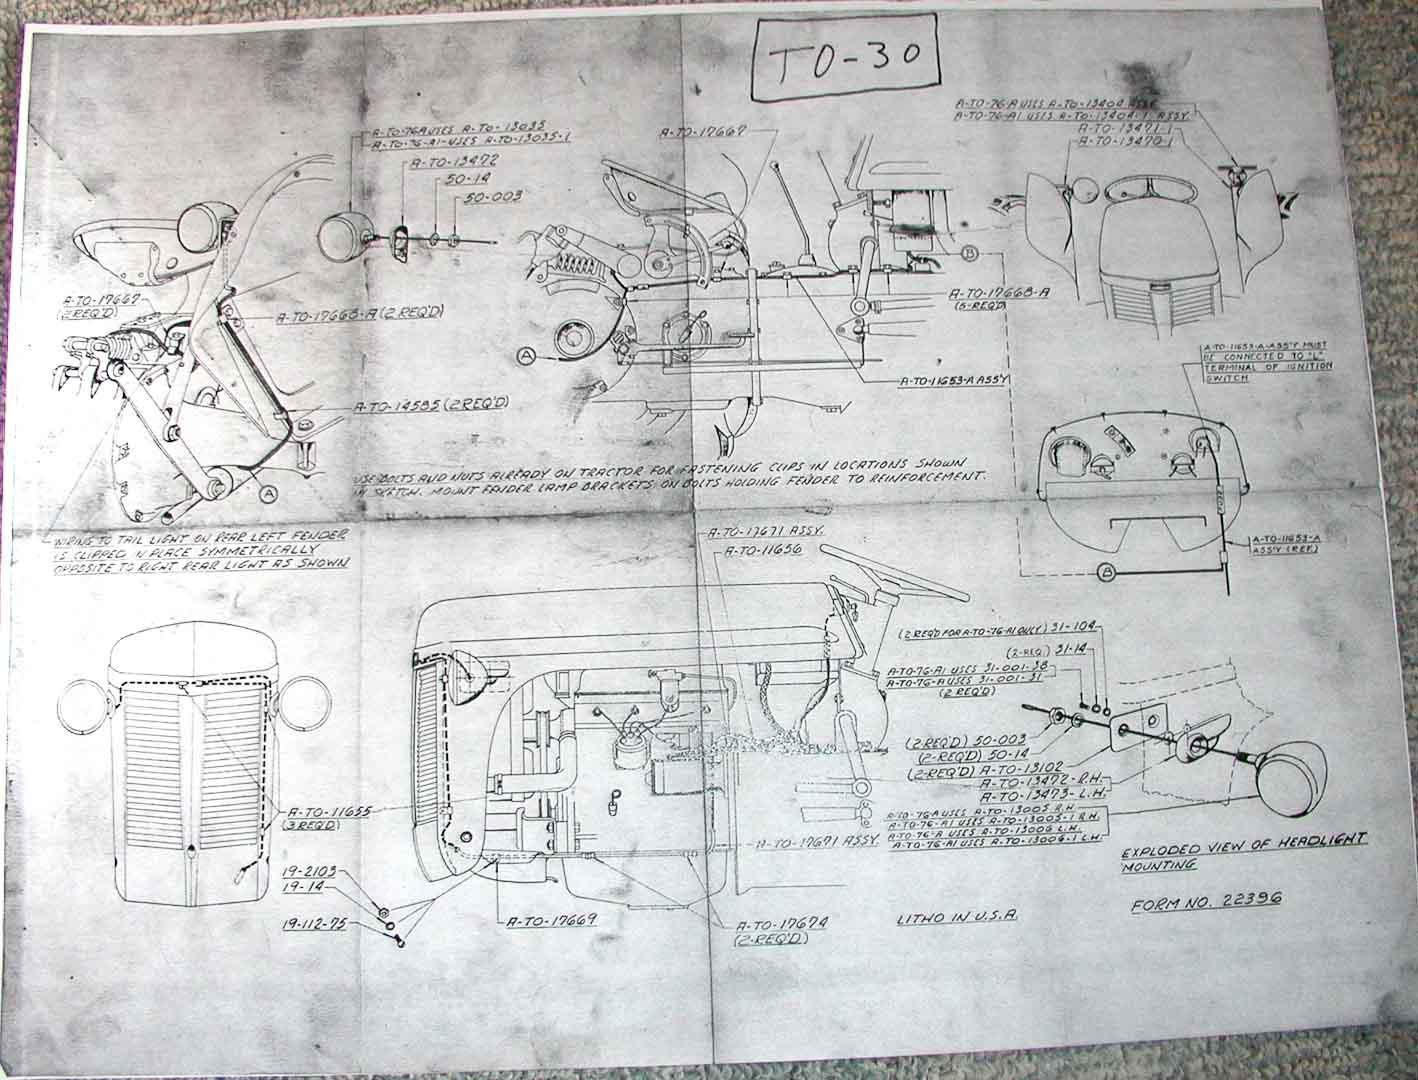 6v To 12v Conversion Mh 44 Wiring Diagram